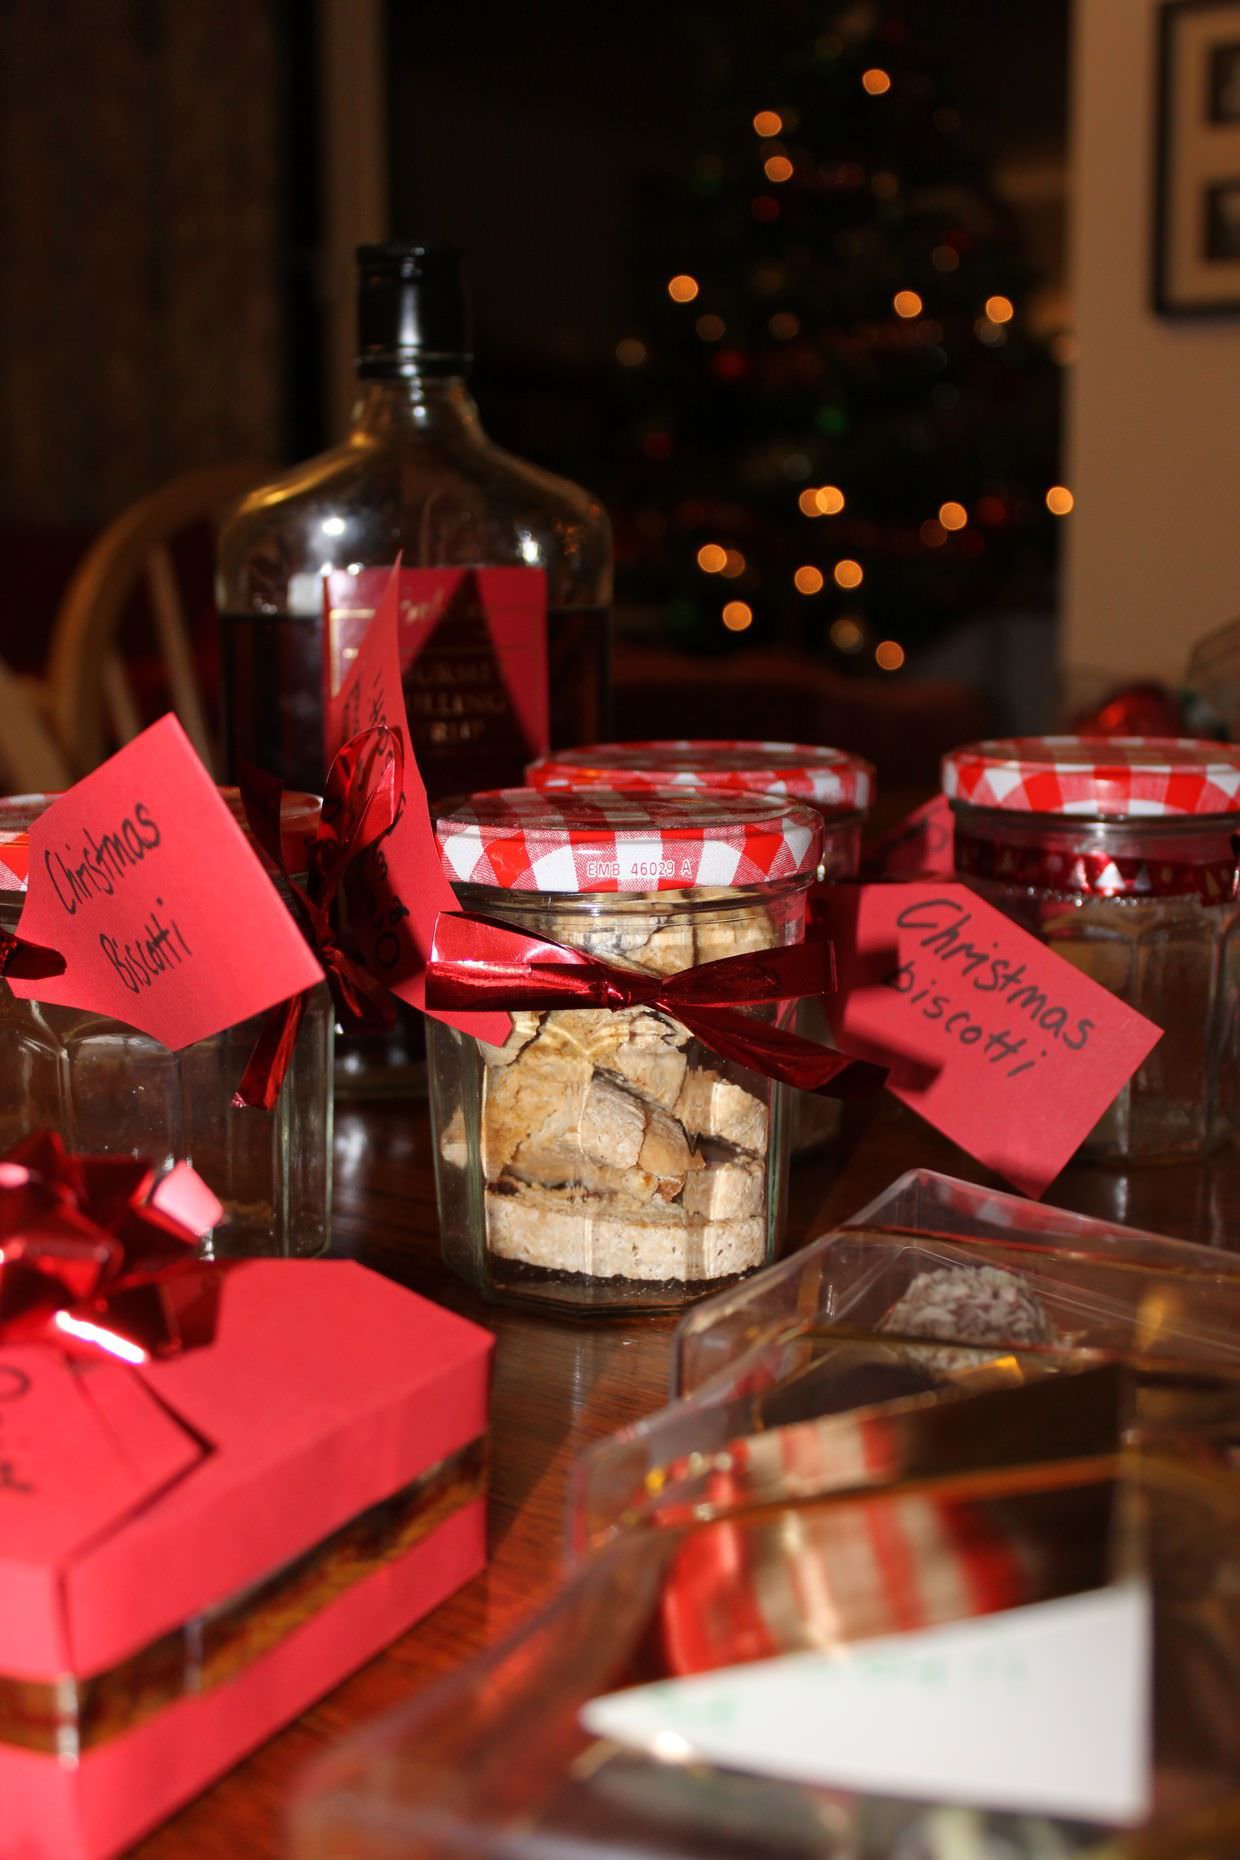 Homemade Christmas biscotti